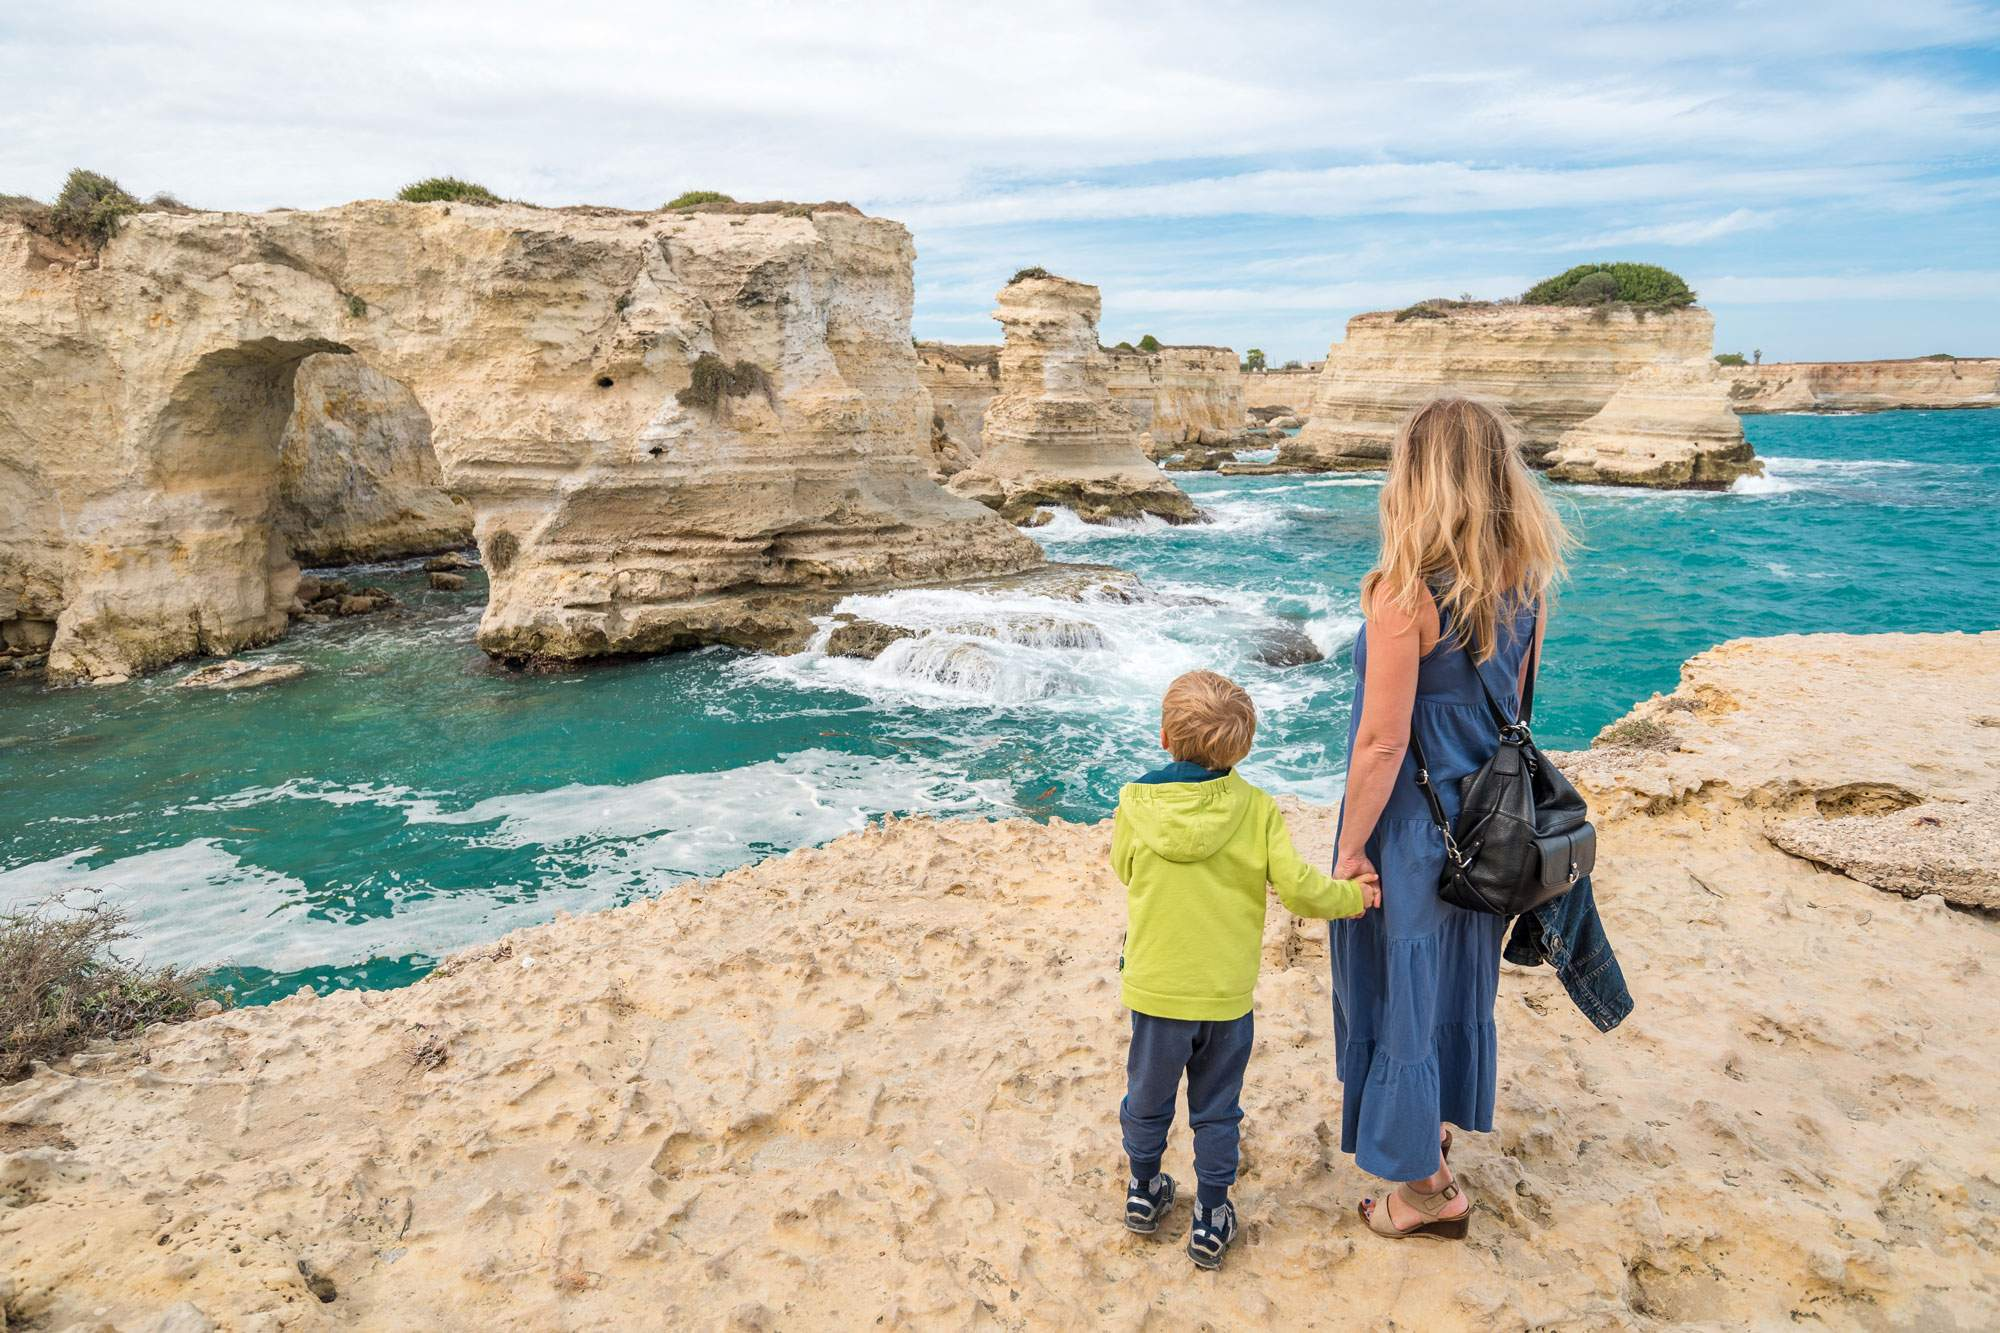 puglia-travel-kids-torre-sant-andrea-italy-travel